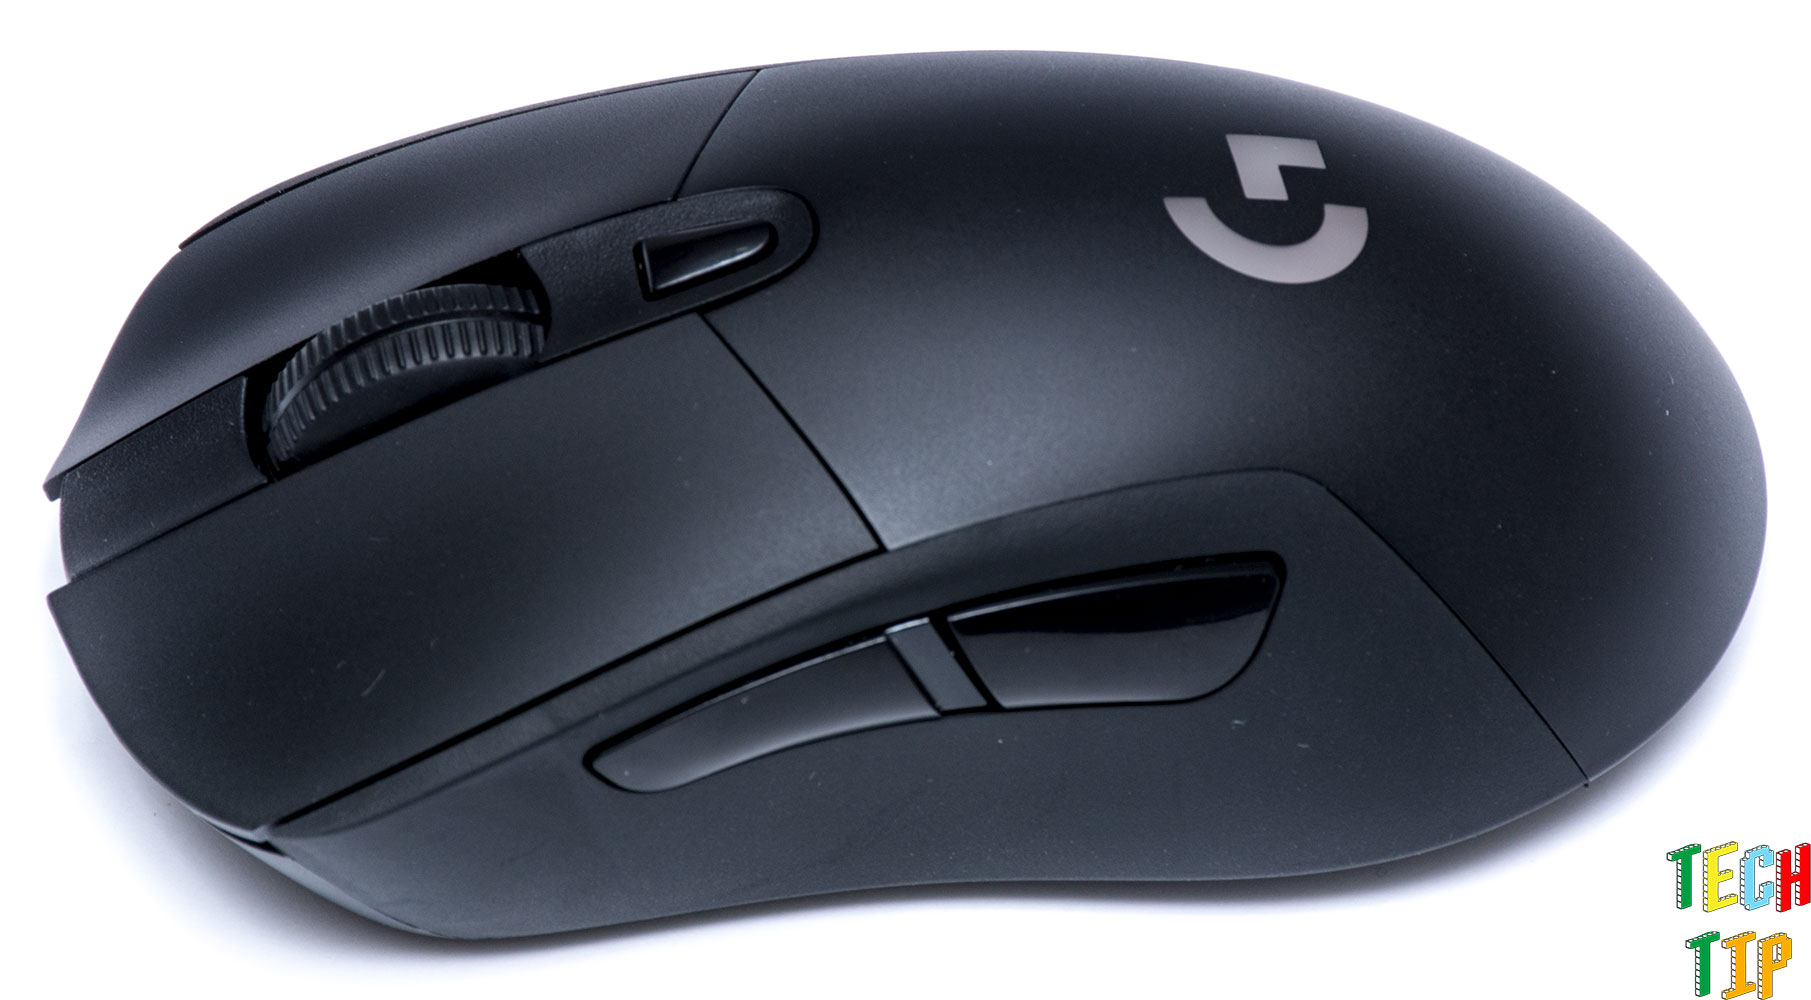 G403-side